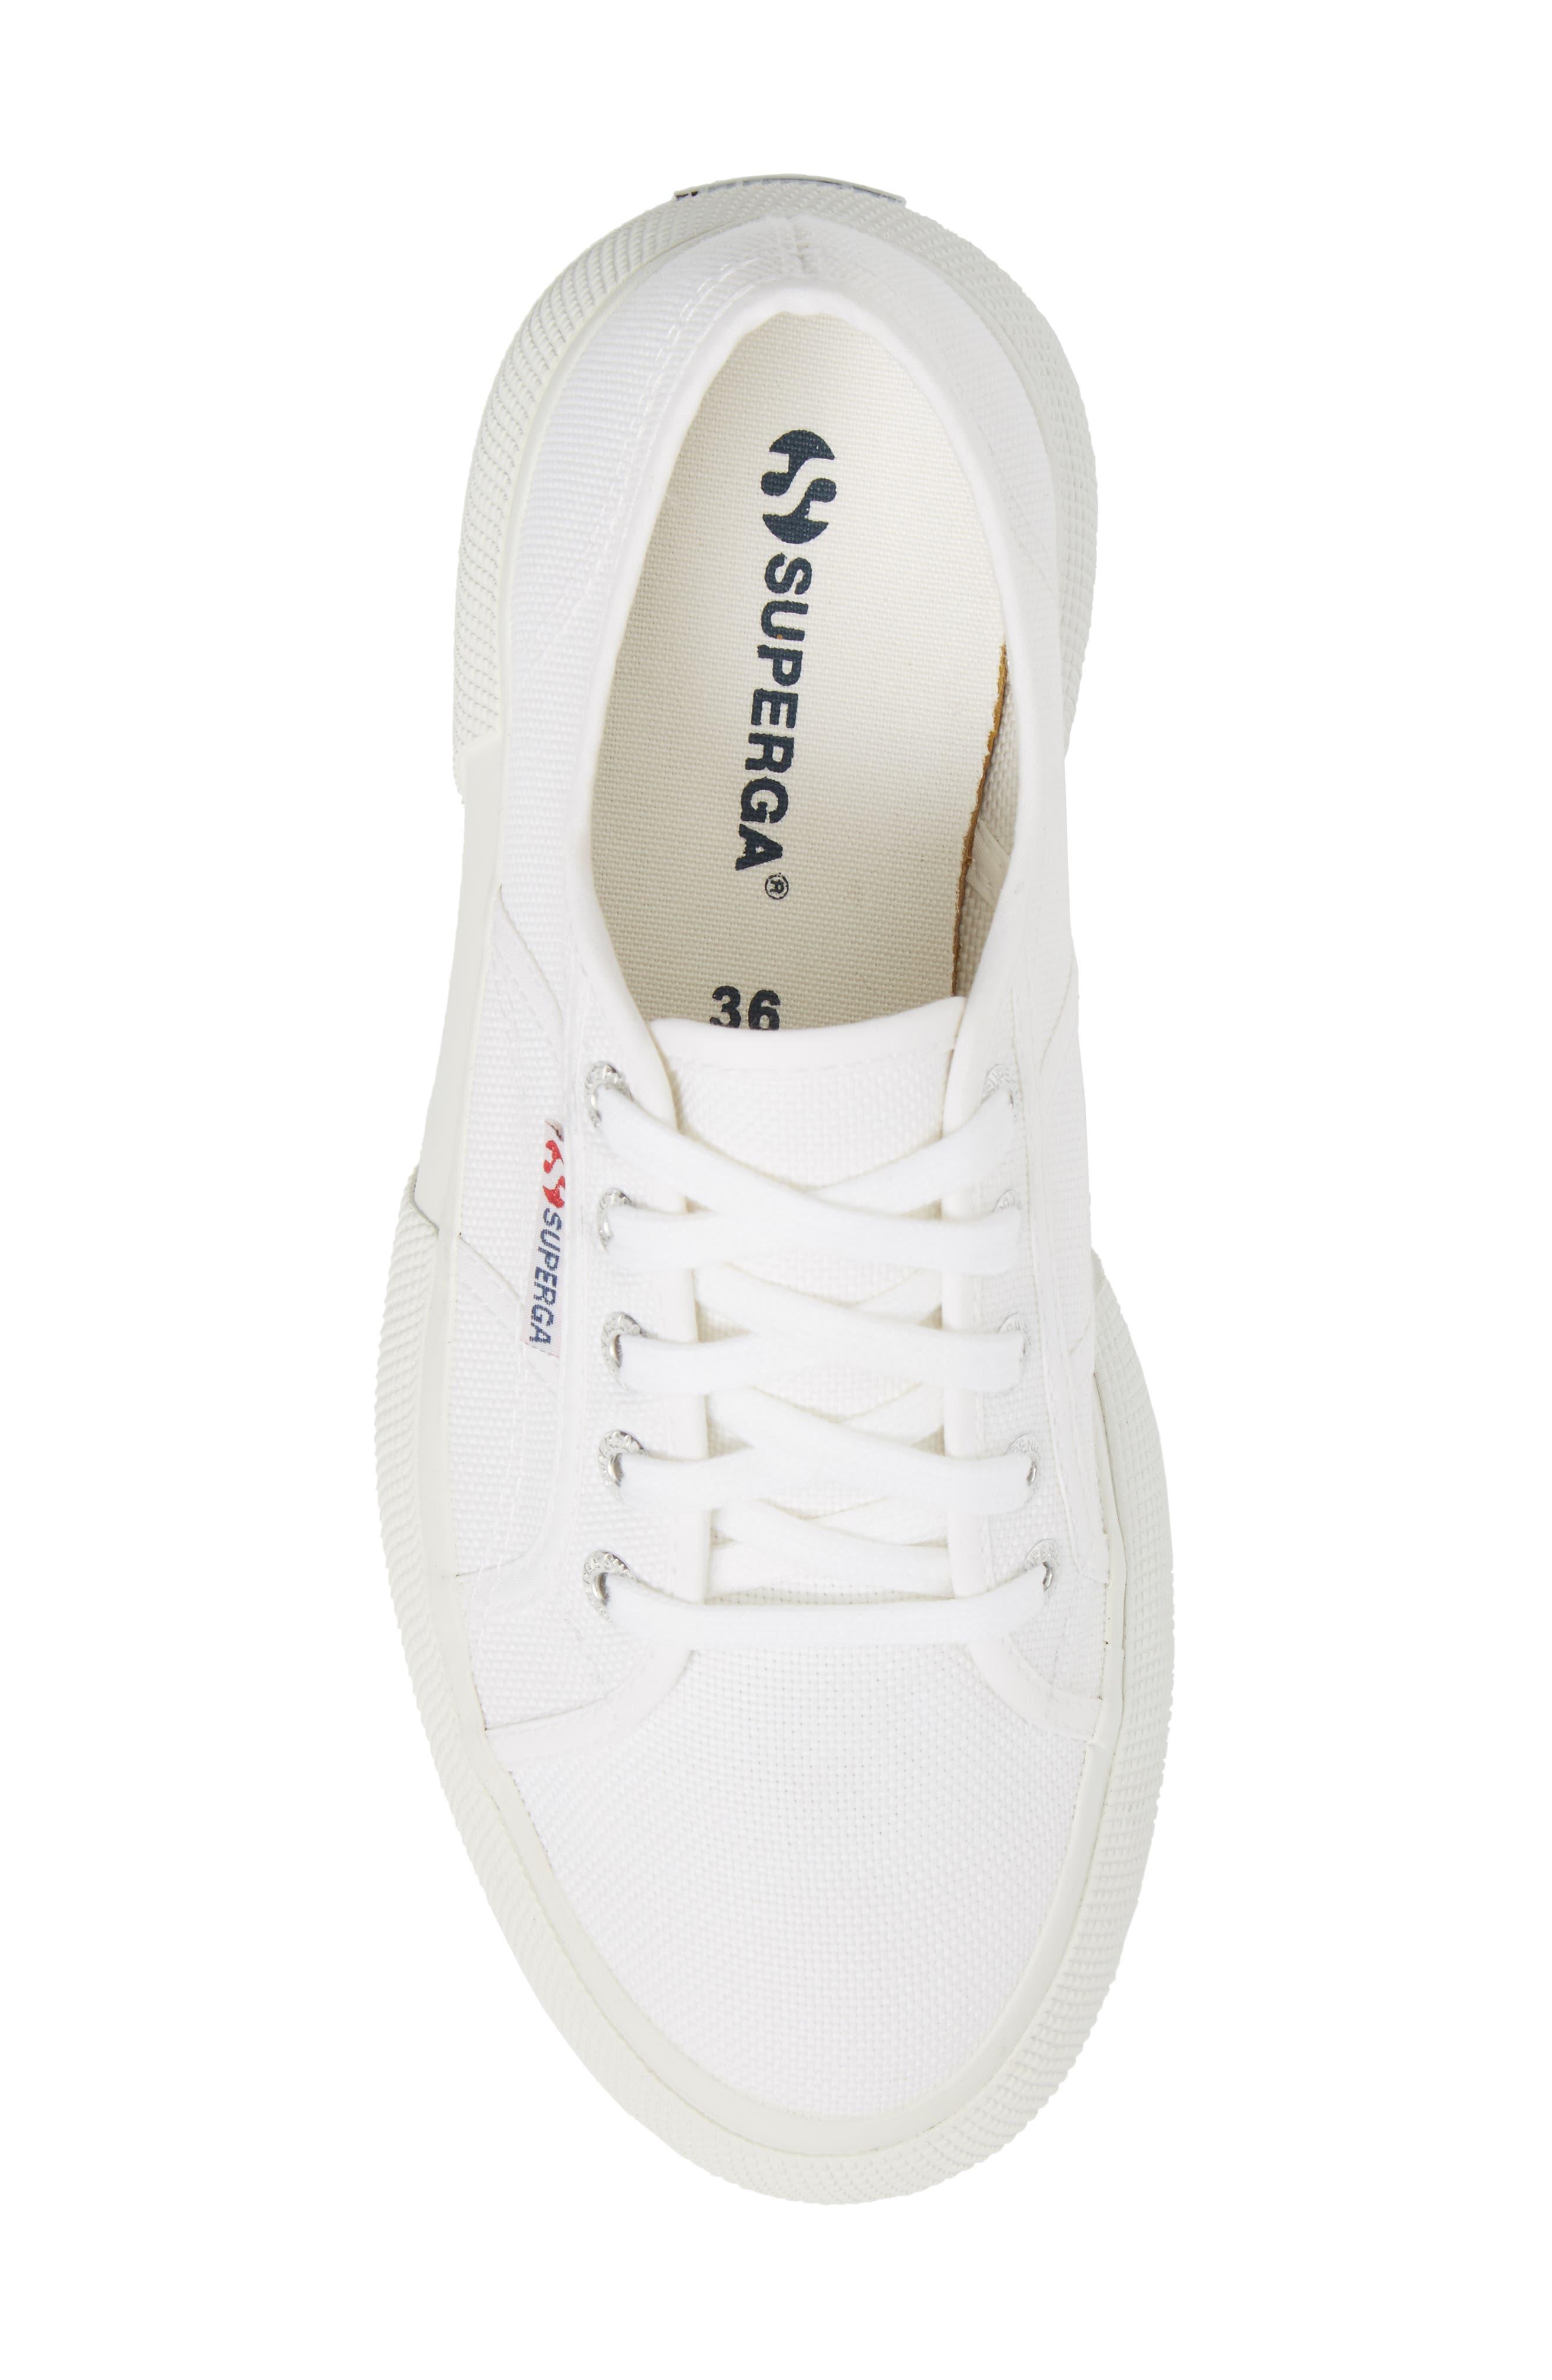 2287 Cotu Platform Sneaker,                             Alternate thumbnail 5, color,                             White